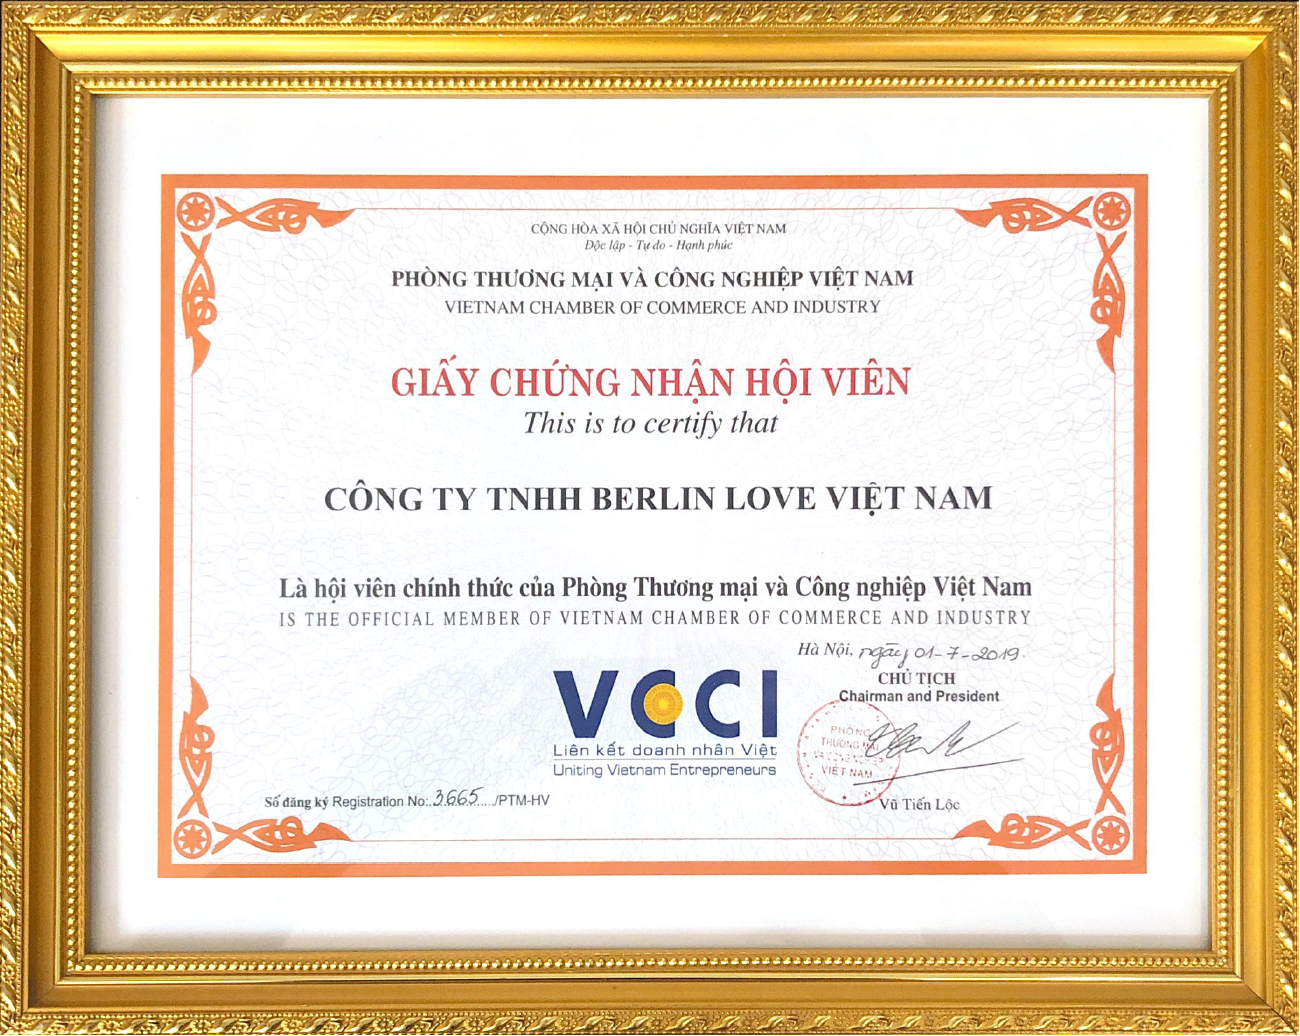 VCCI Certification Partnership